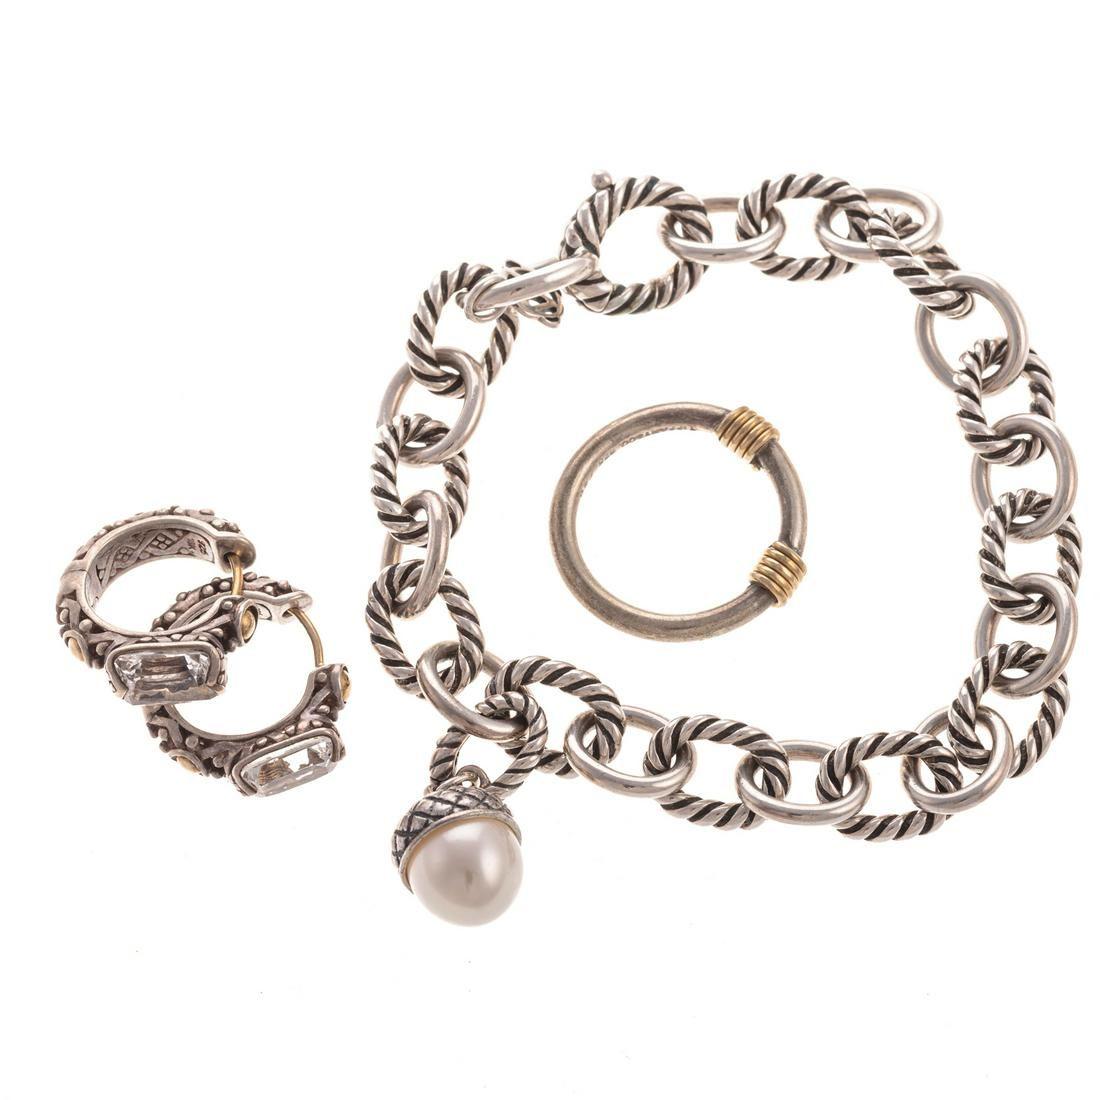 A Tiffany & Co. Ring with David Yurman Bracelet